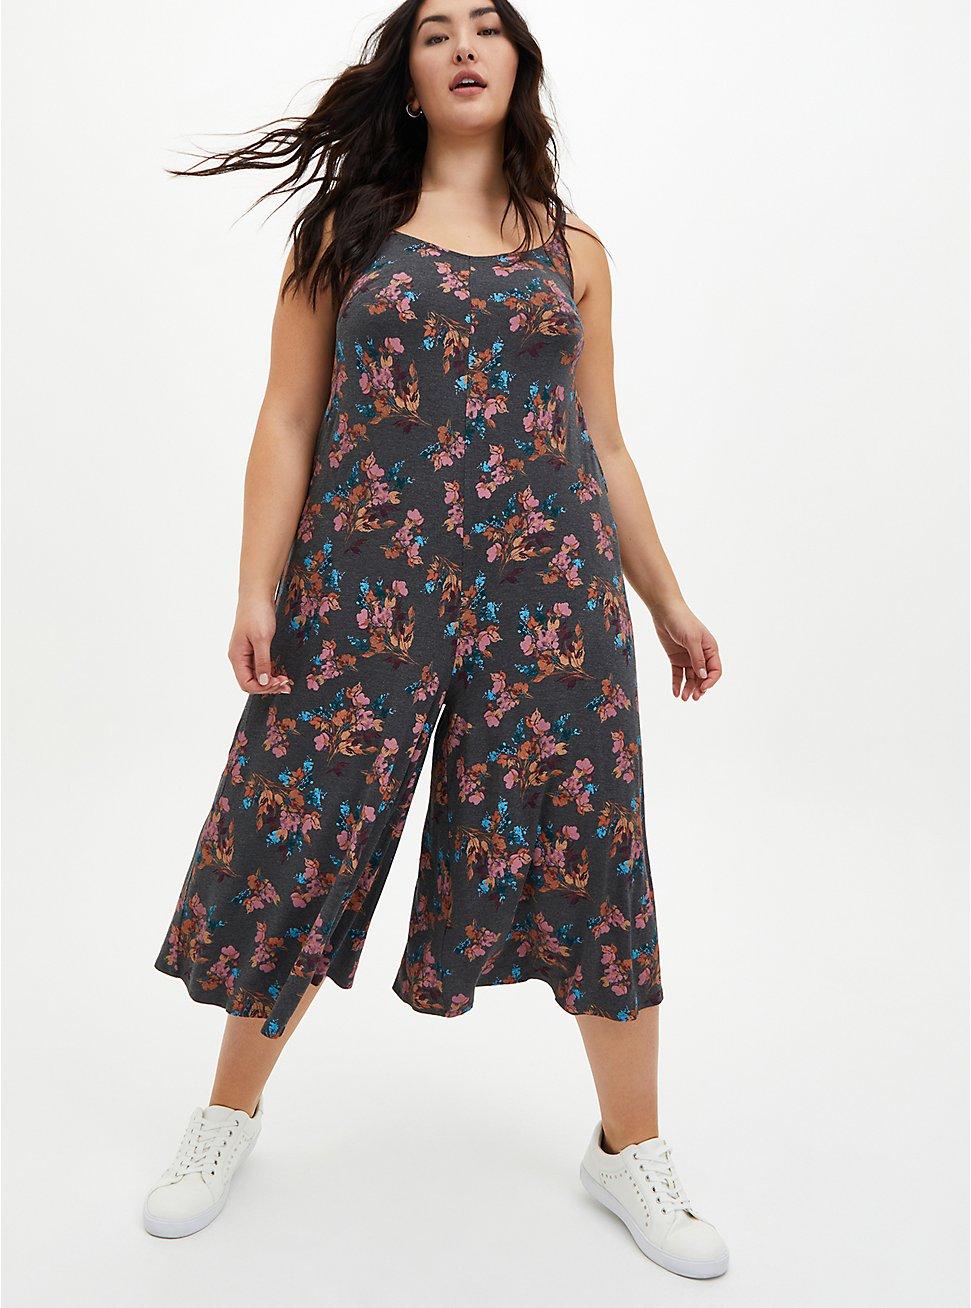 Super Soft Grey Floral Culotte Jumpsuit, FLORAL - GREY, hi-res